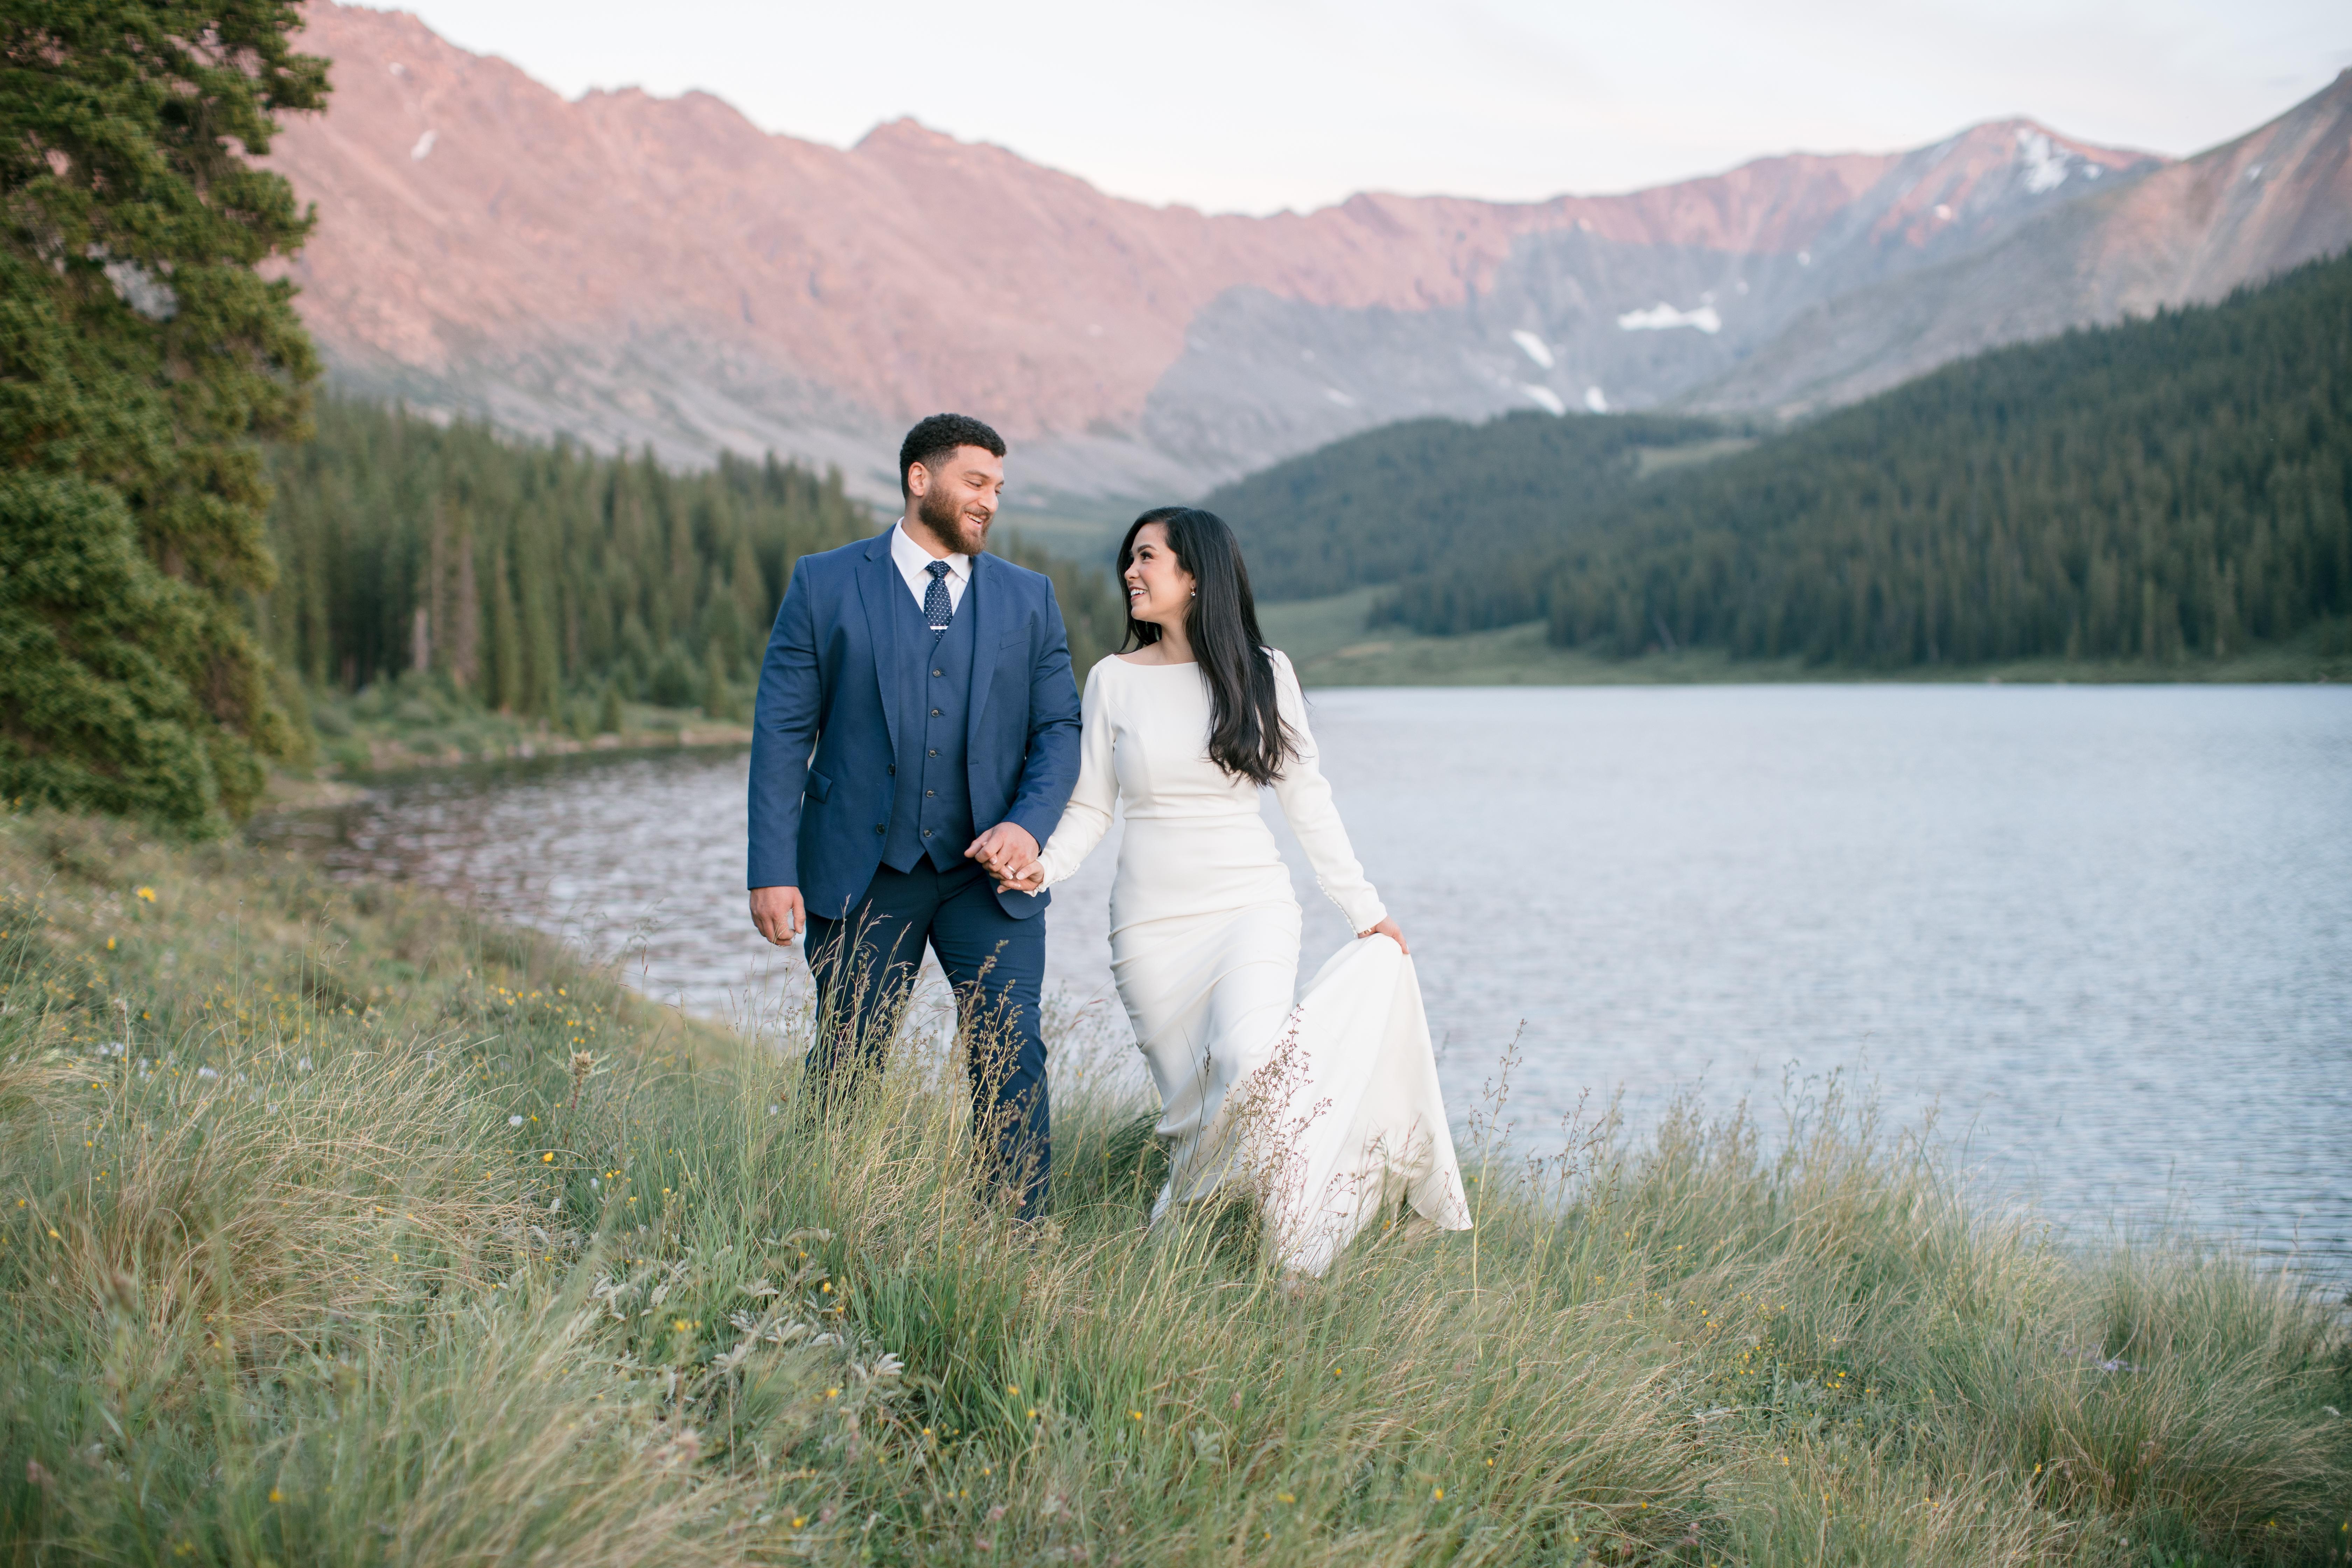 Clinton-Gulch-Reservoir-Breckenridge-Colorado-Elopement